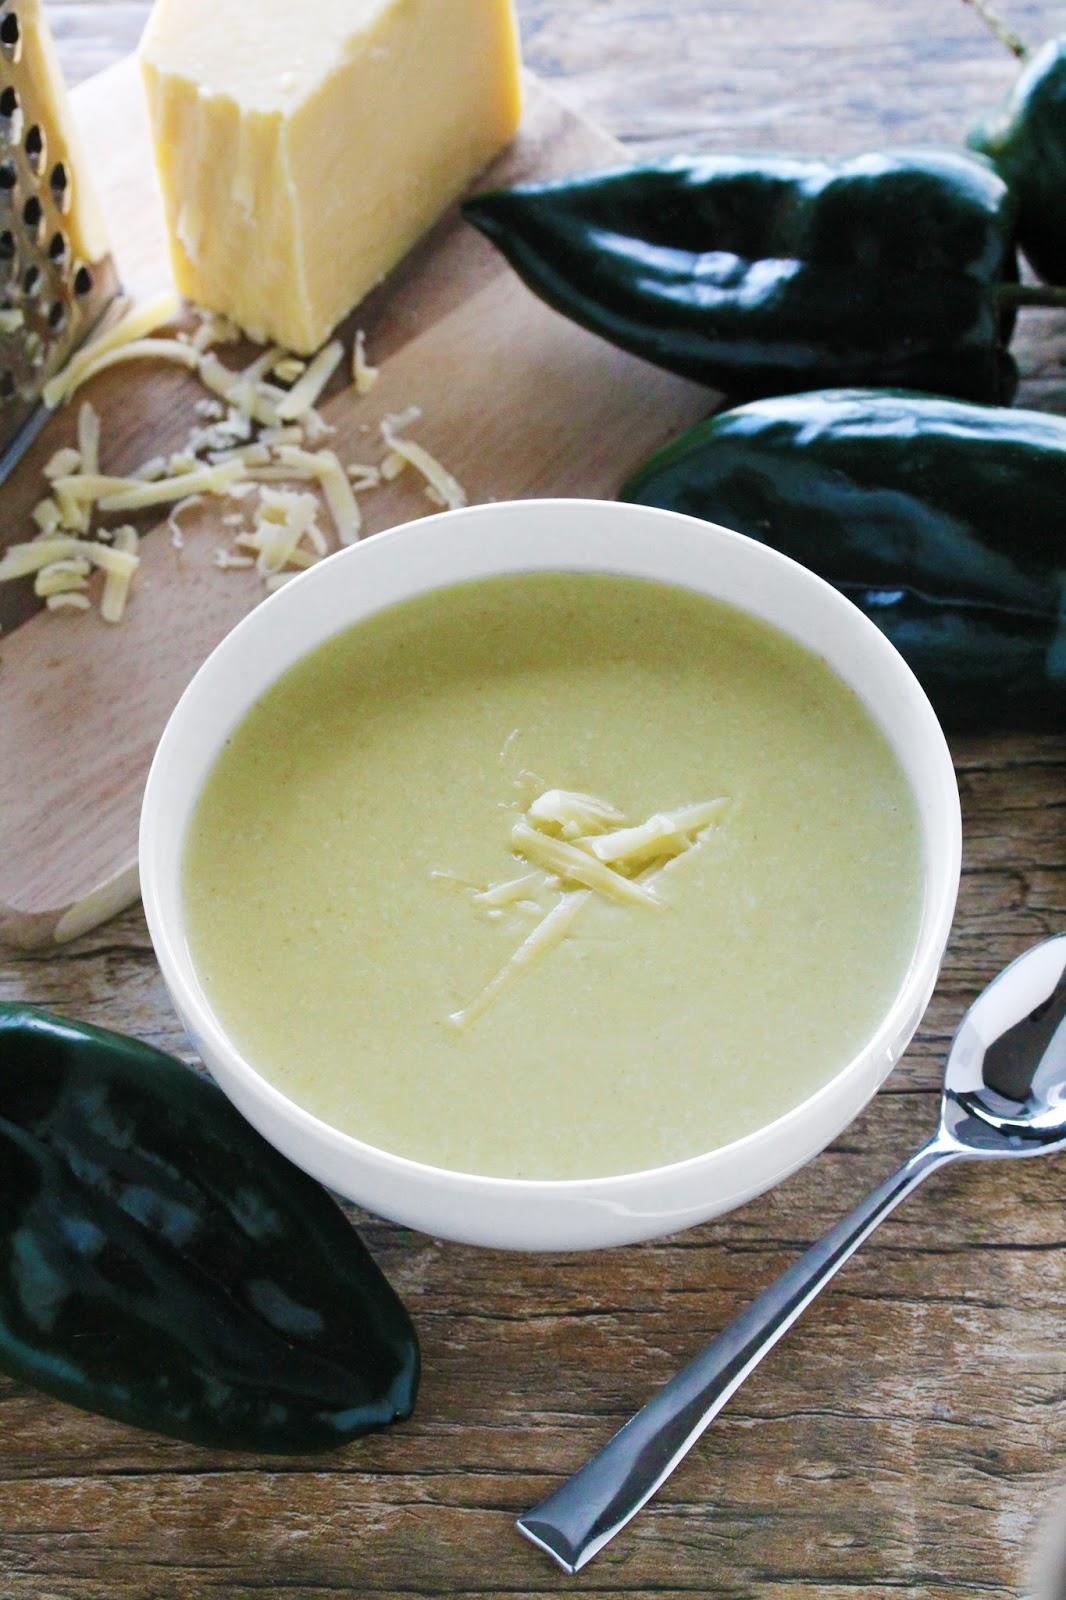 Soups Archivesthestayathomechef.com